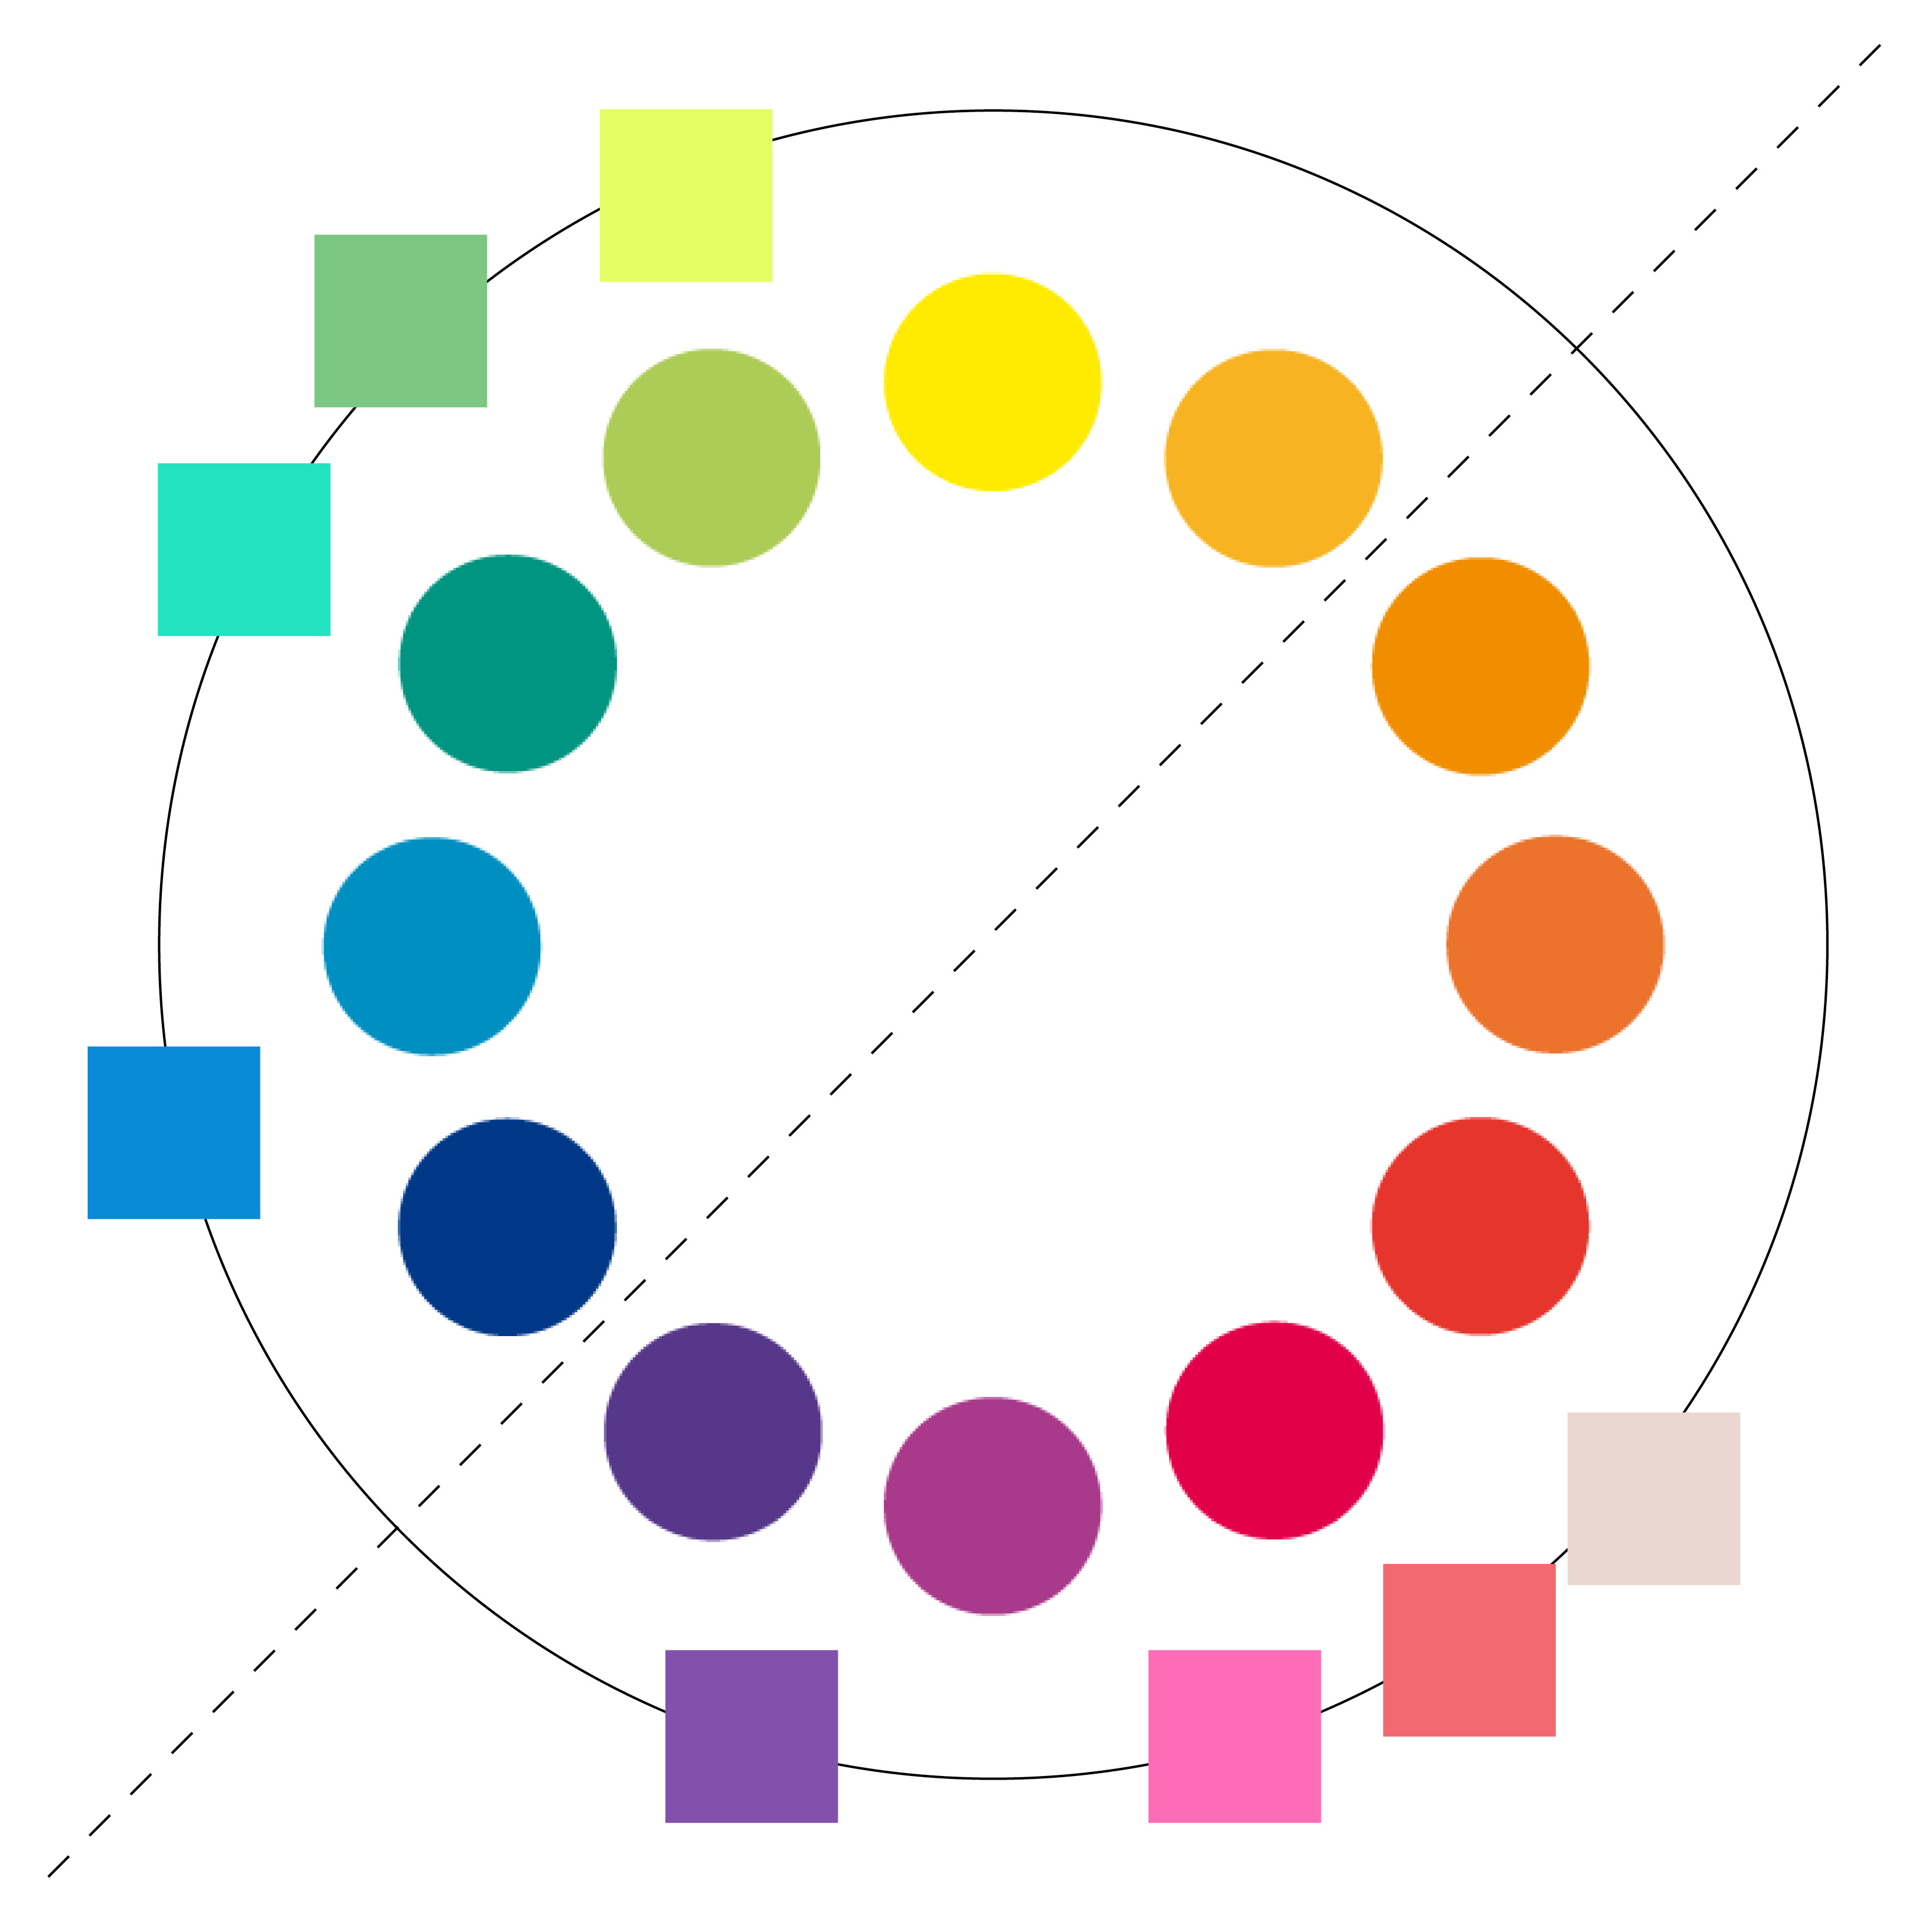 Färgschema 2 diagonal.jpg